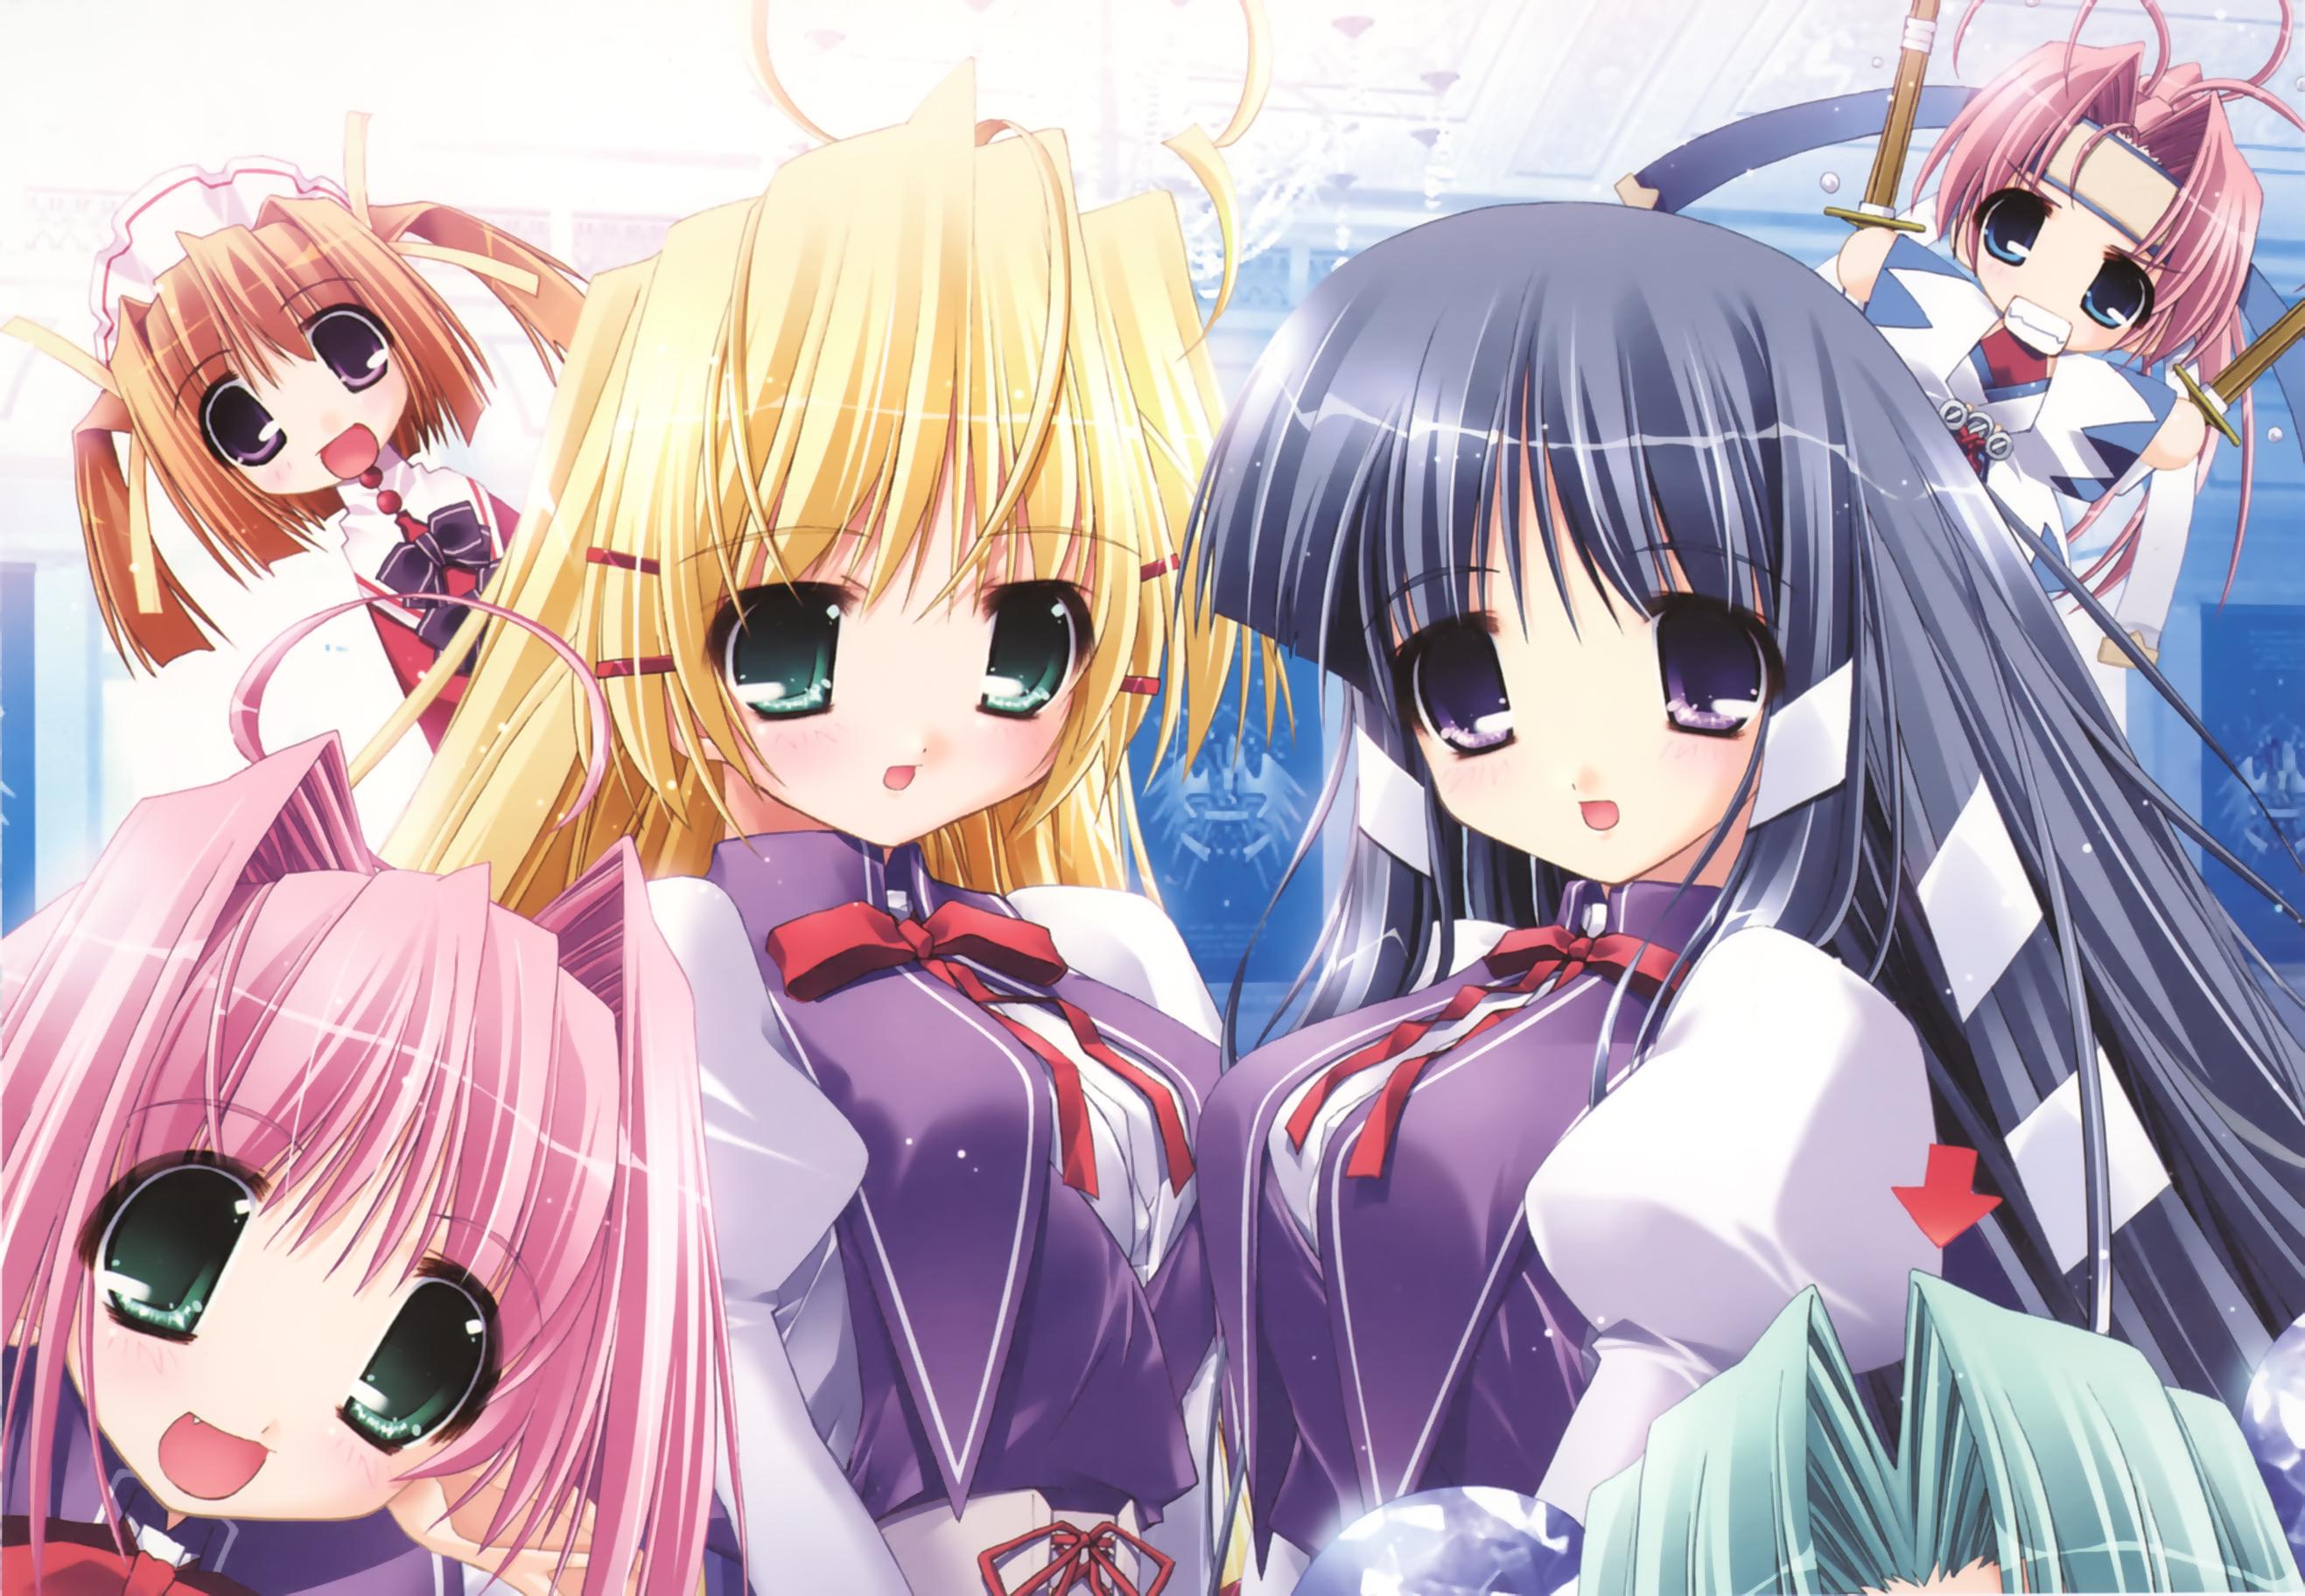 Anime Love Wallpapers: Anime Love Wallpapers For Desktop